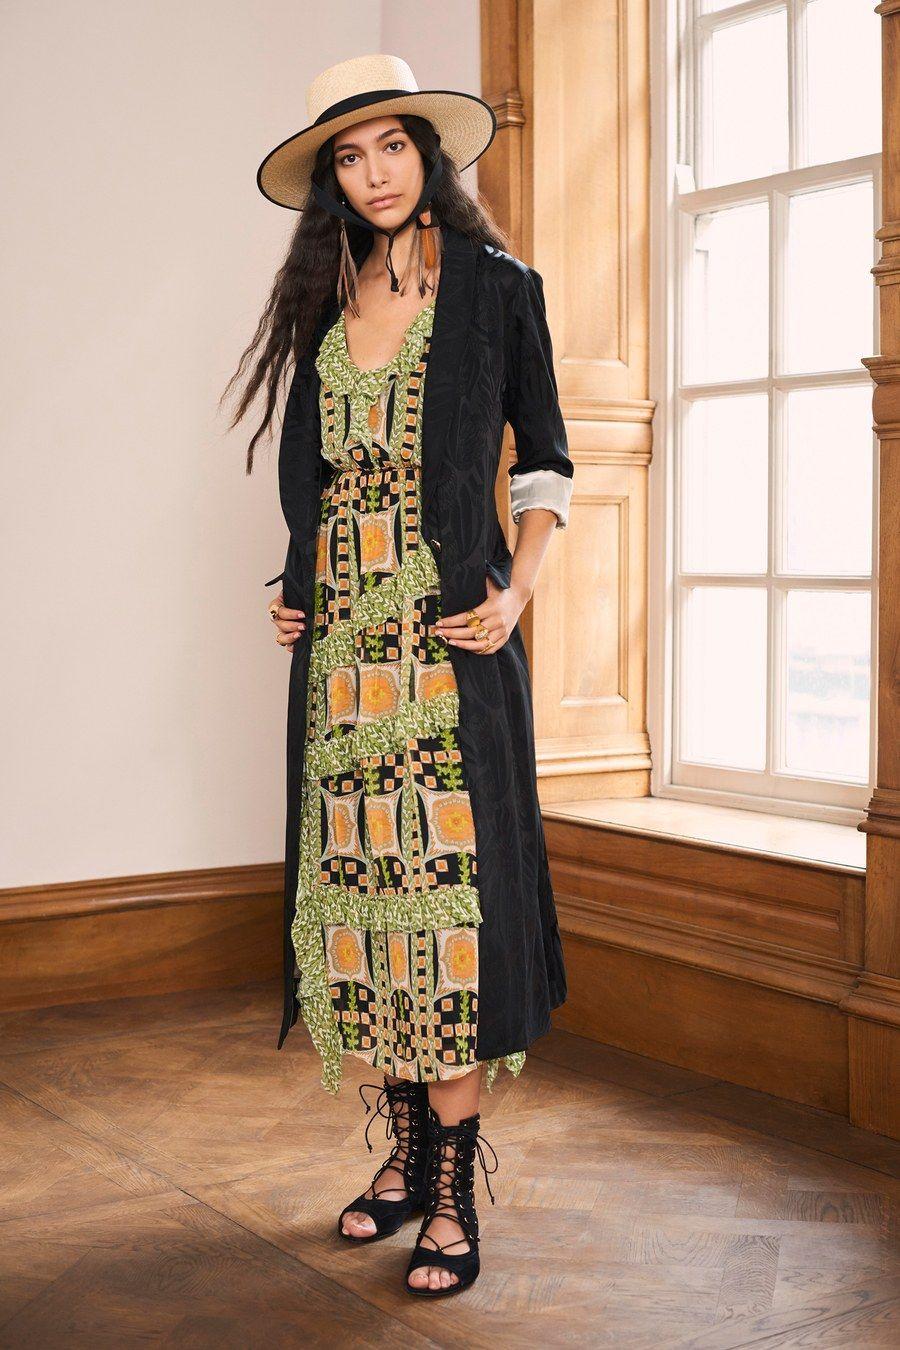 Paris Fashion Week: Chanel Spring 2020 Collection | Tom